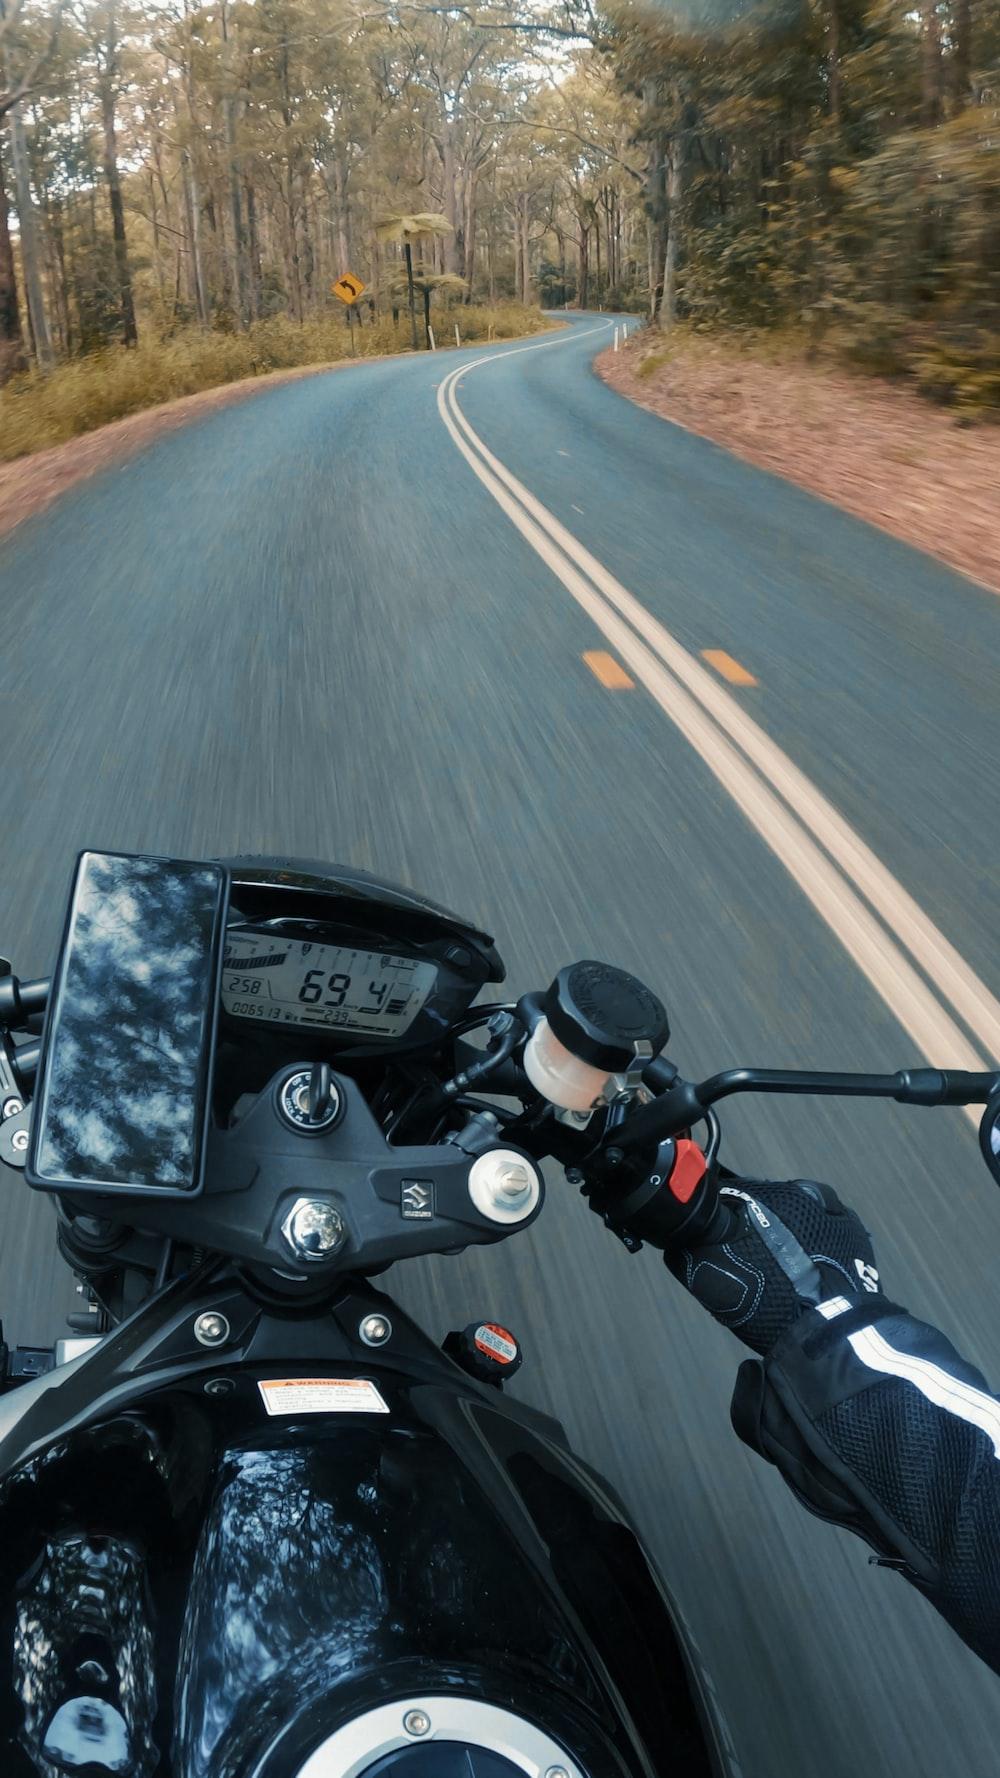 black motorcycle on gray asphalt road during daytime